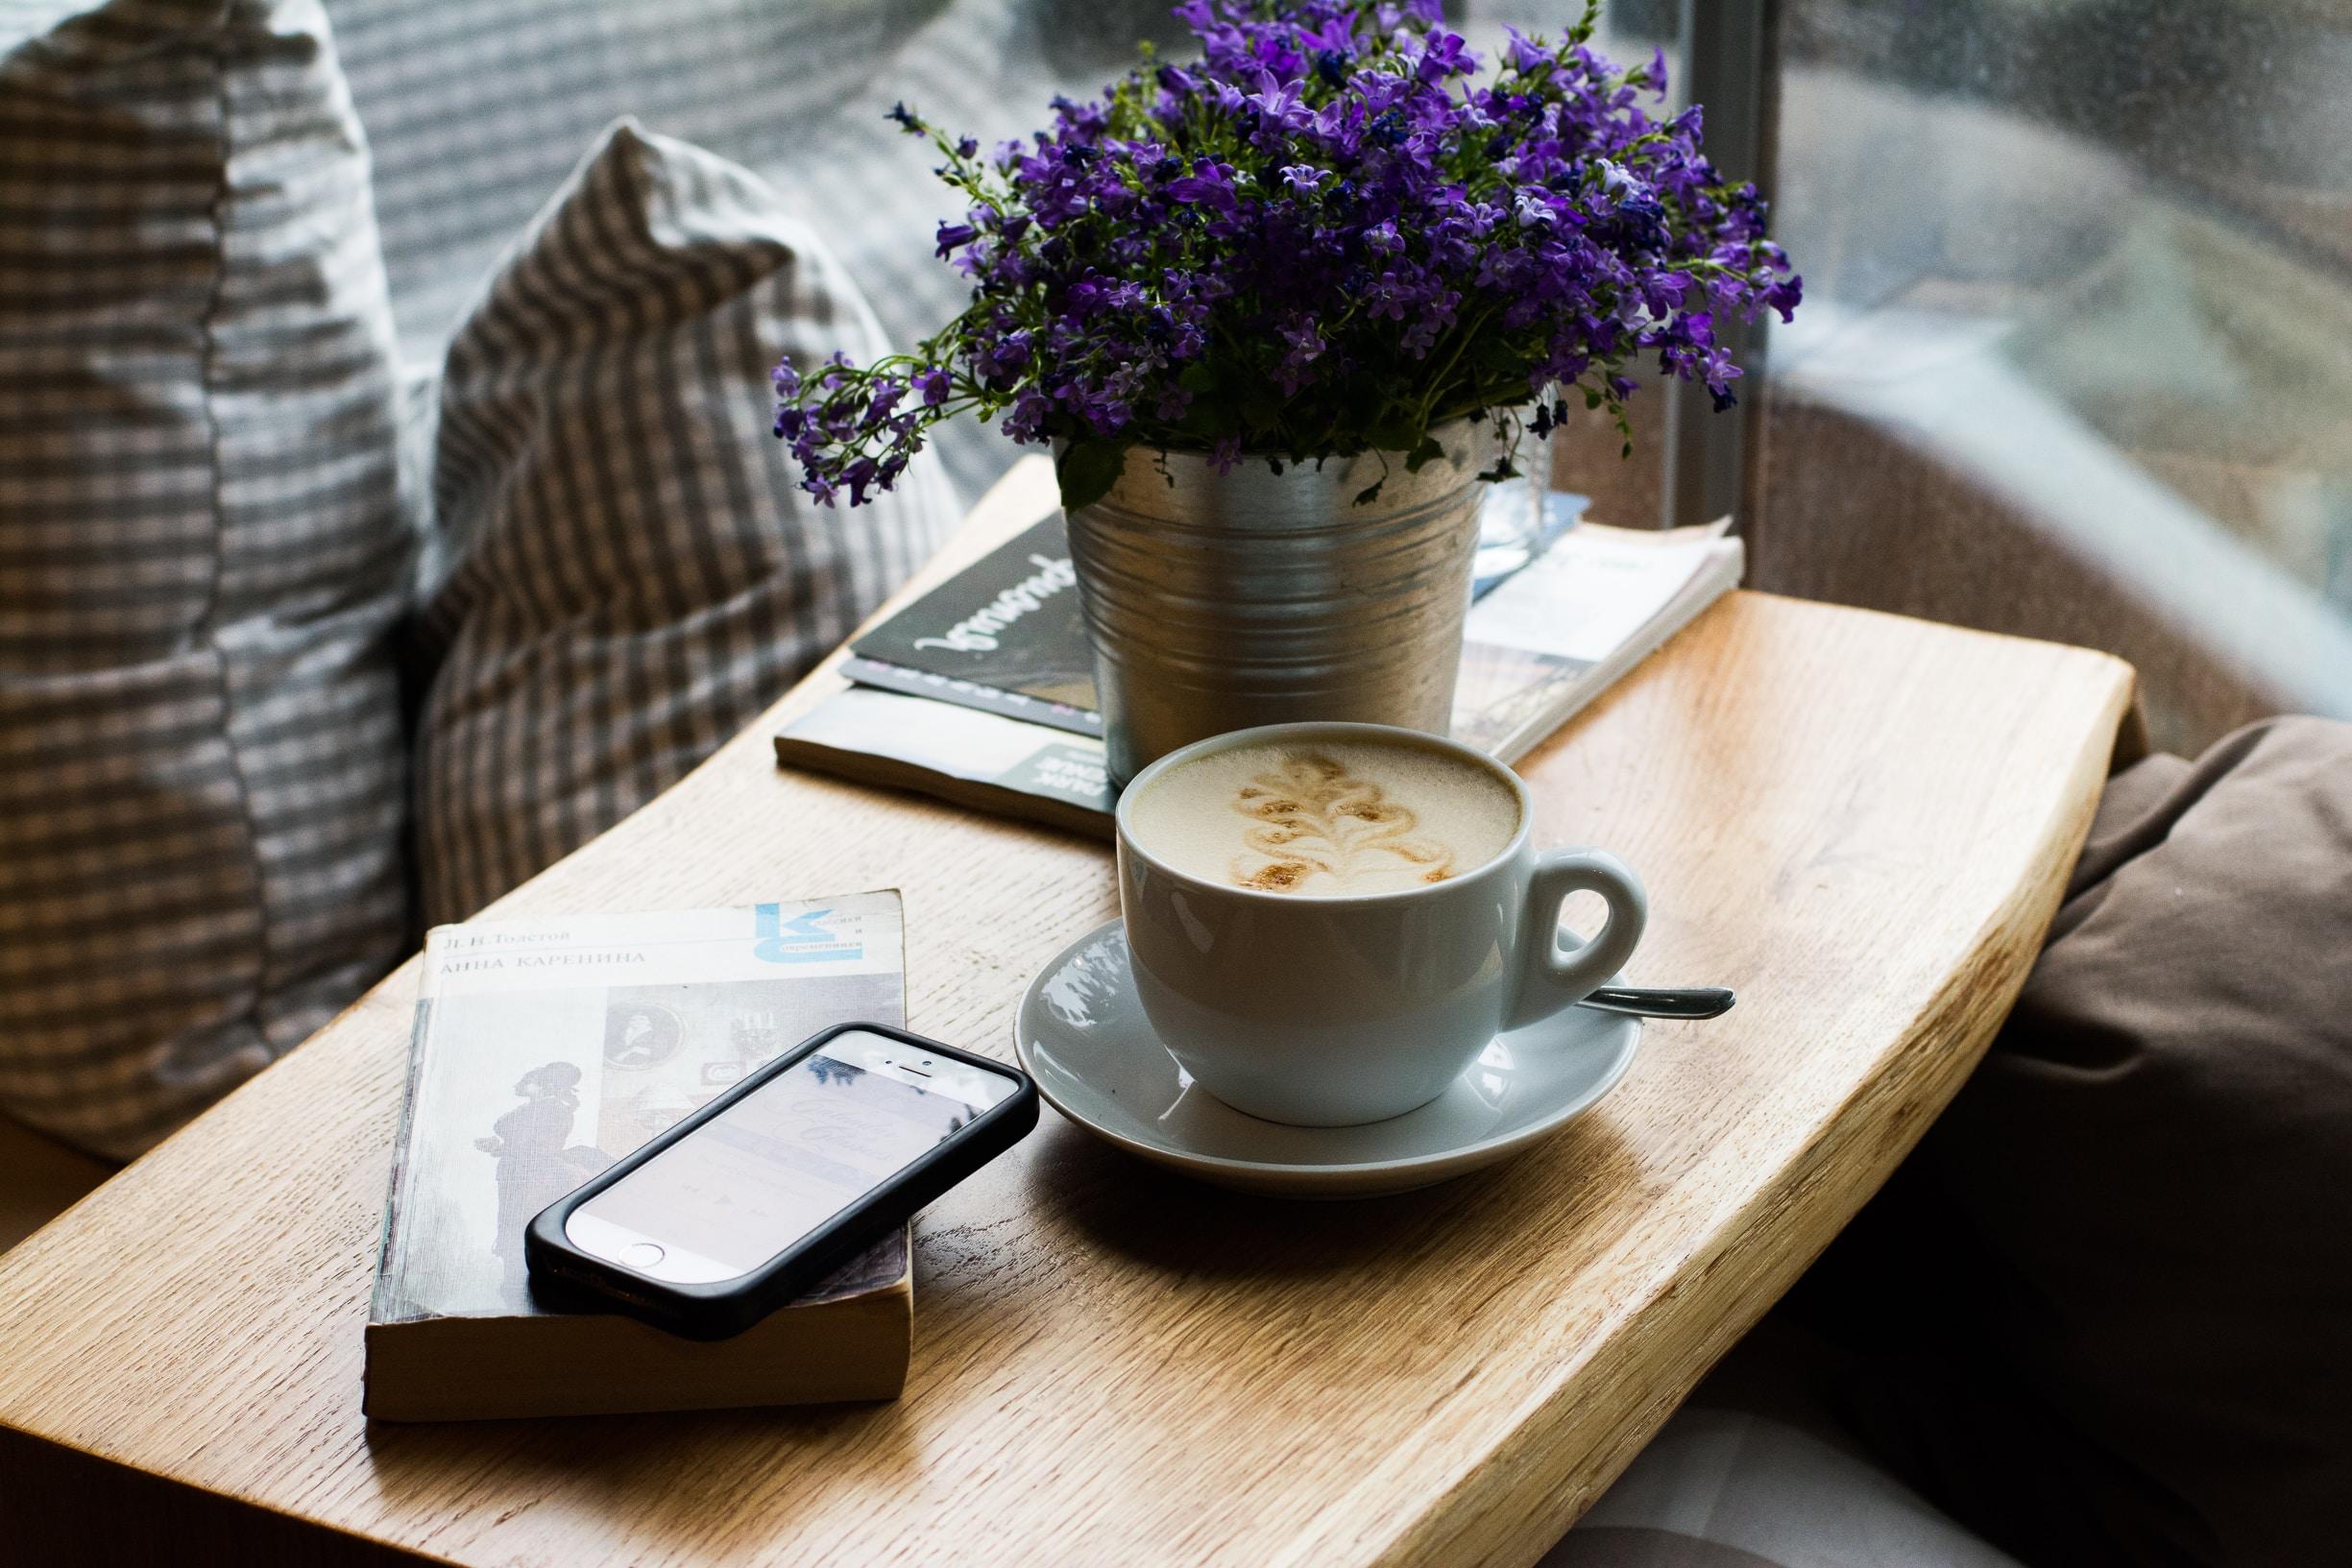 white ceramic mug with latte art